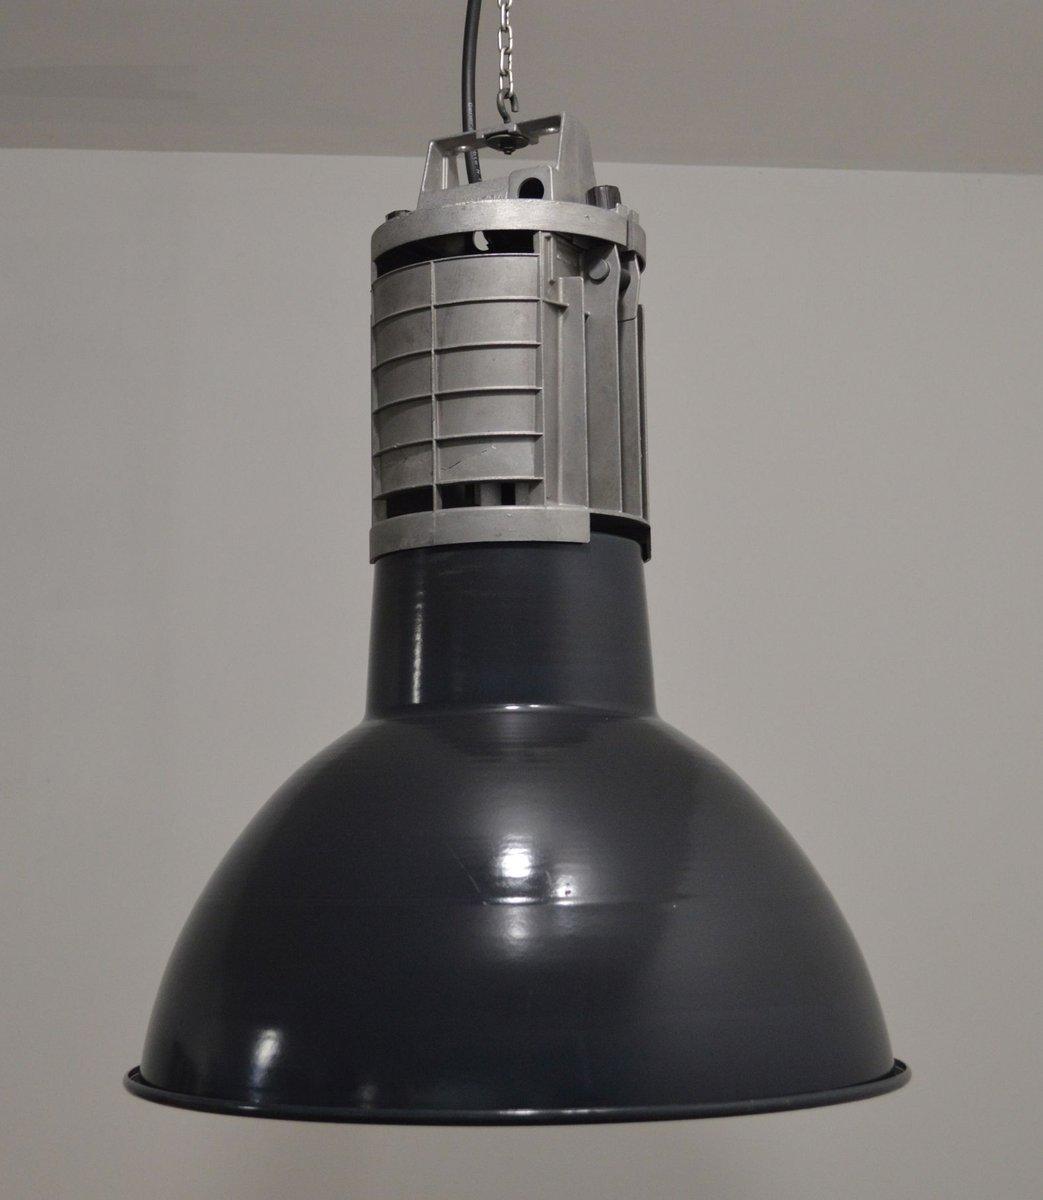 lampe suspension industrielle vintage de mazda en vente. Black Bedroom Furniture Sets. Home Design Ideas